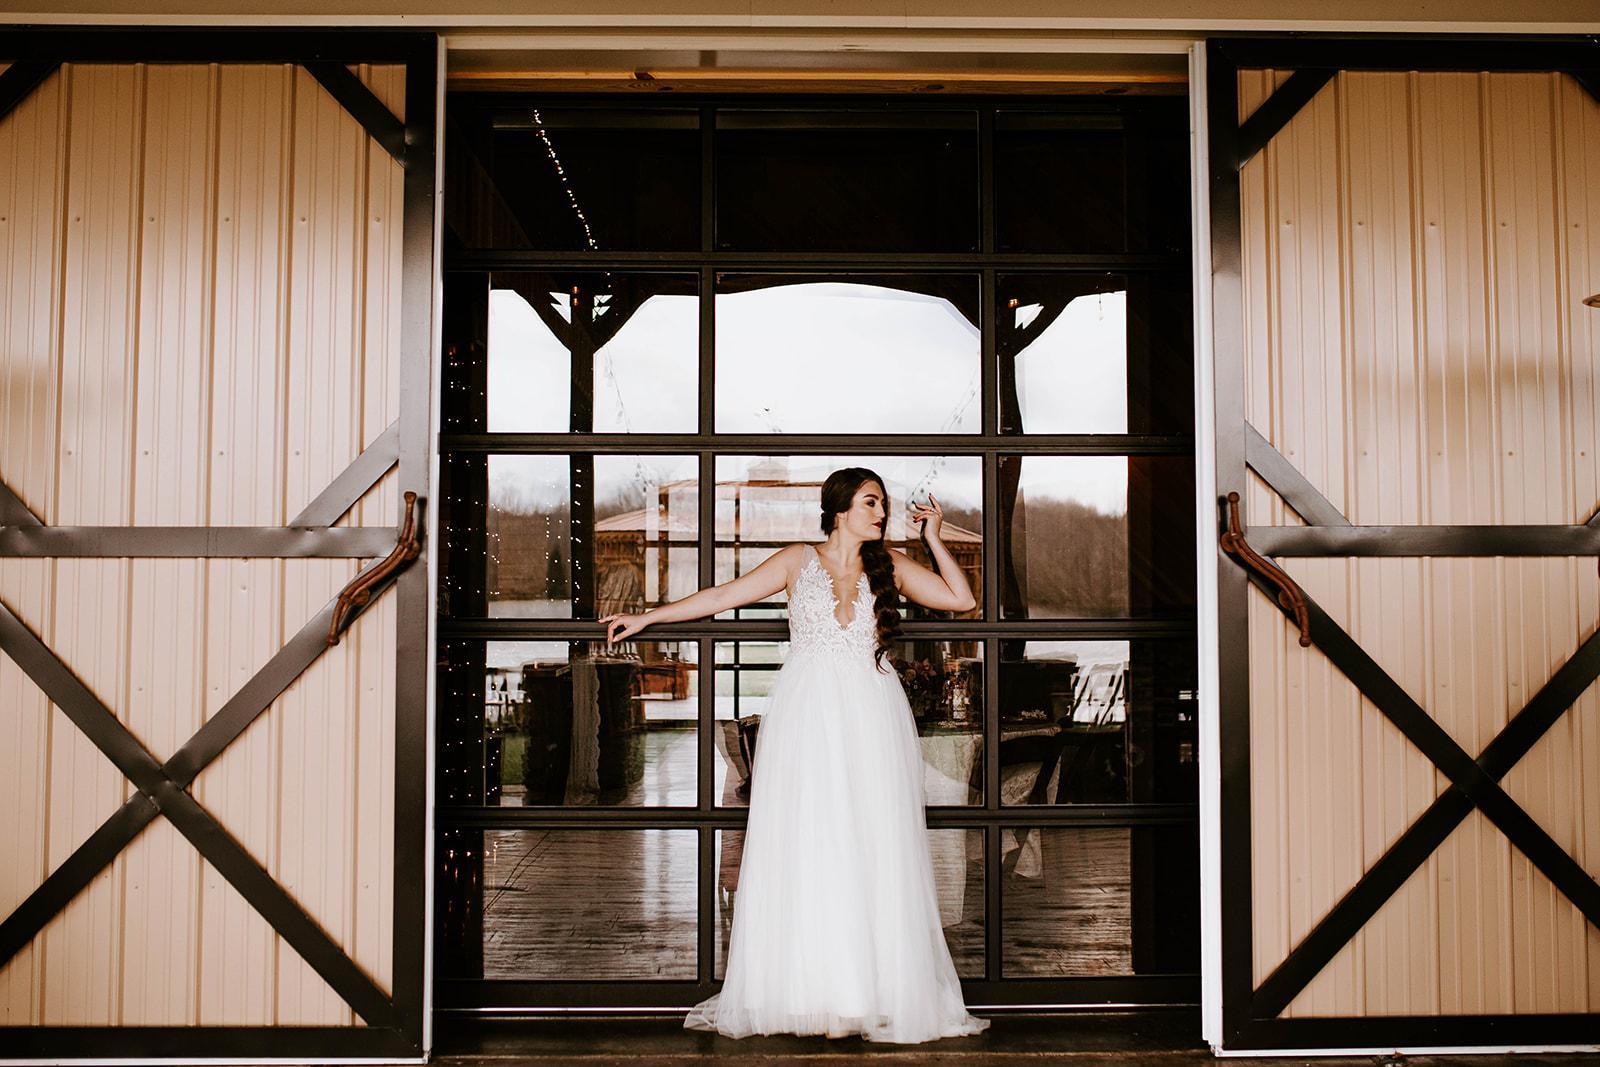 Bridal portrait: Surprise Vow Renewal by Tara Winstead Photography featured on Nashville Bride Guide